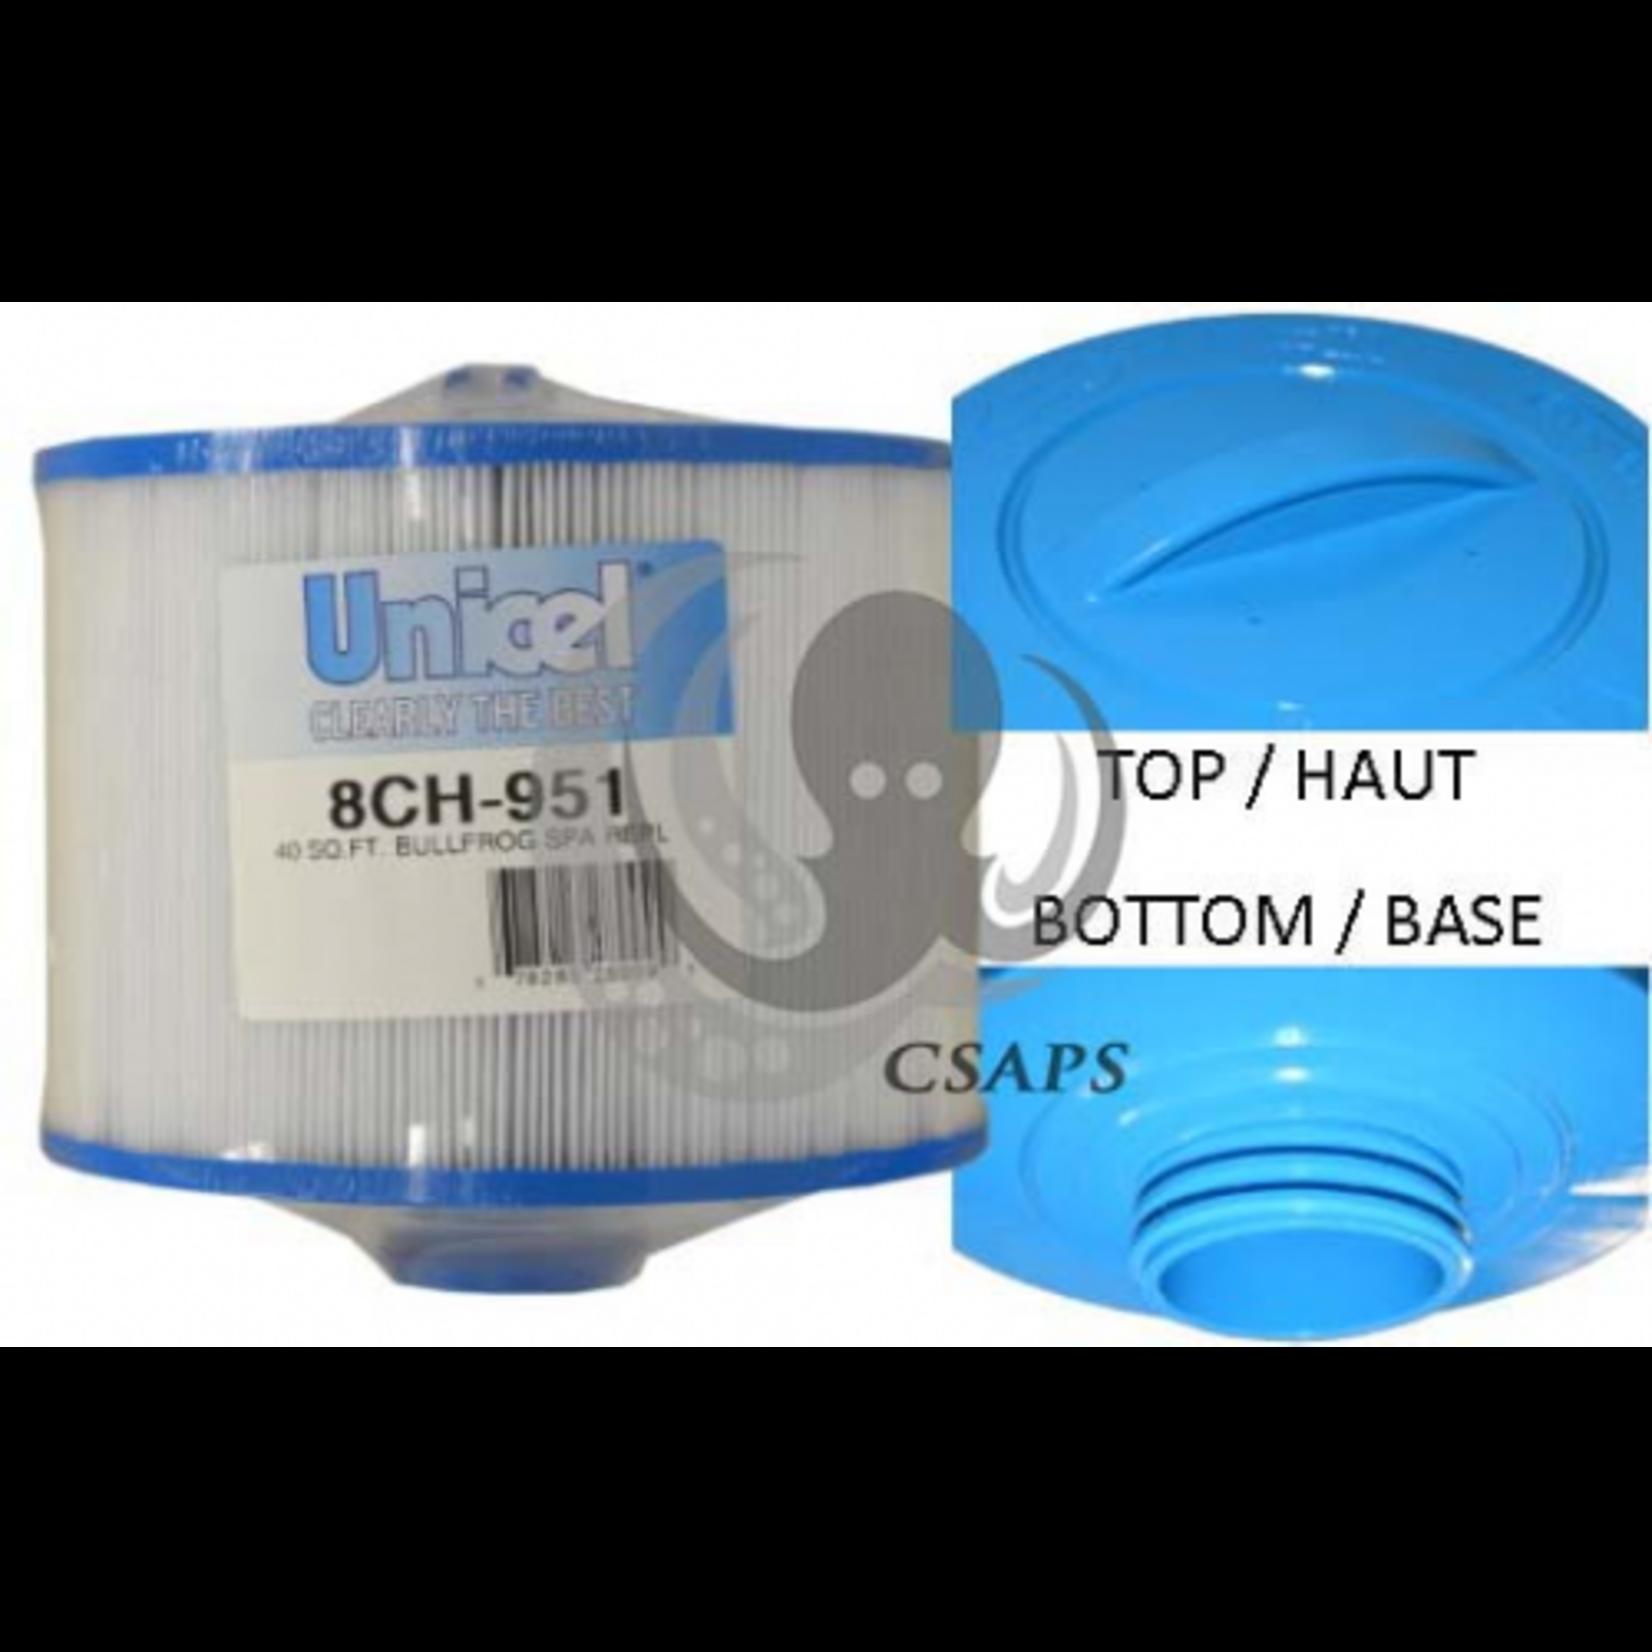 Unicel CARTRIDGE SPA 8CH-951